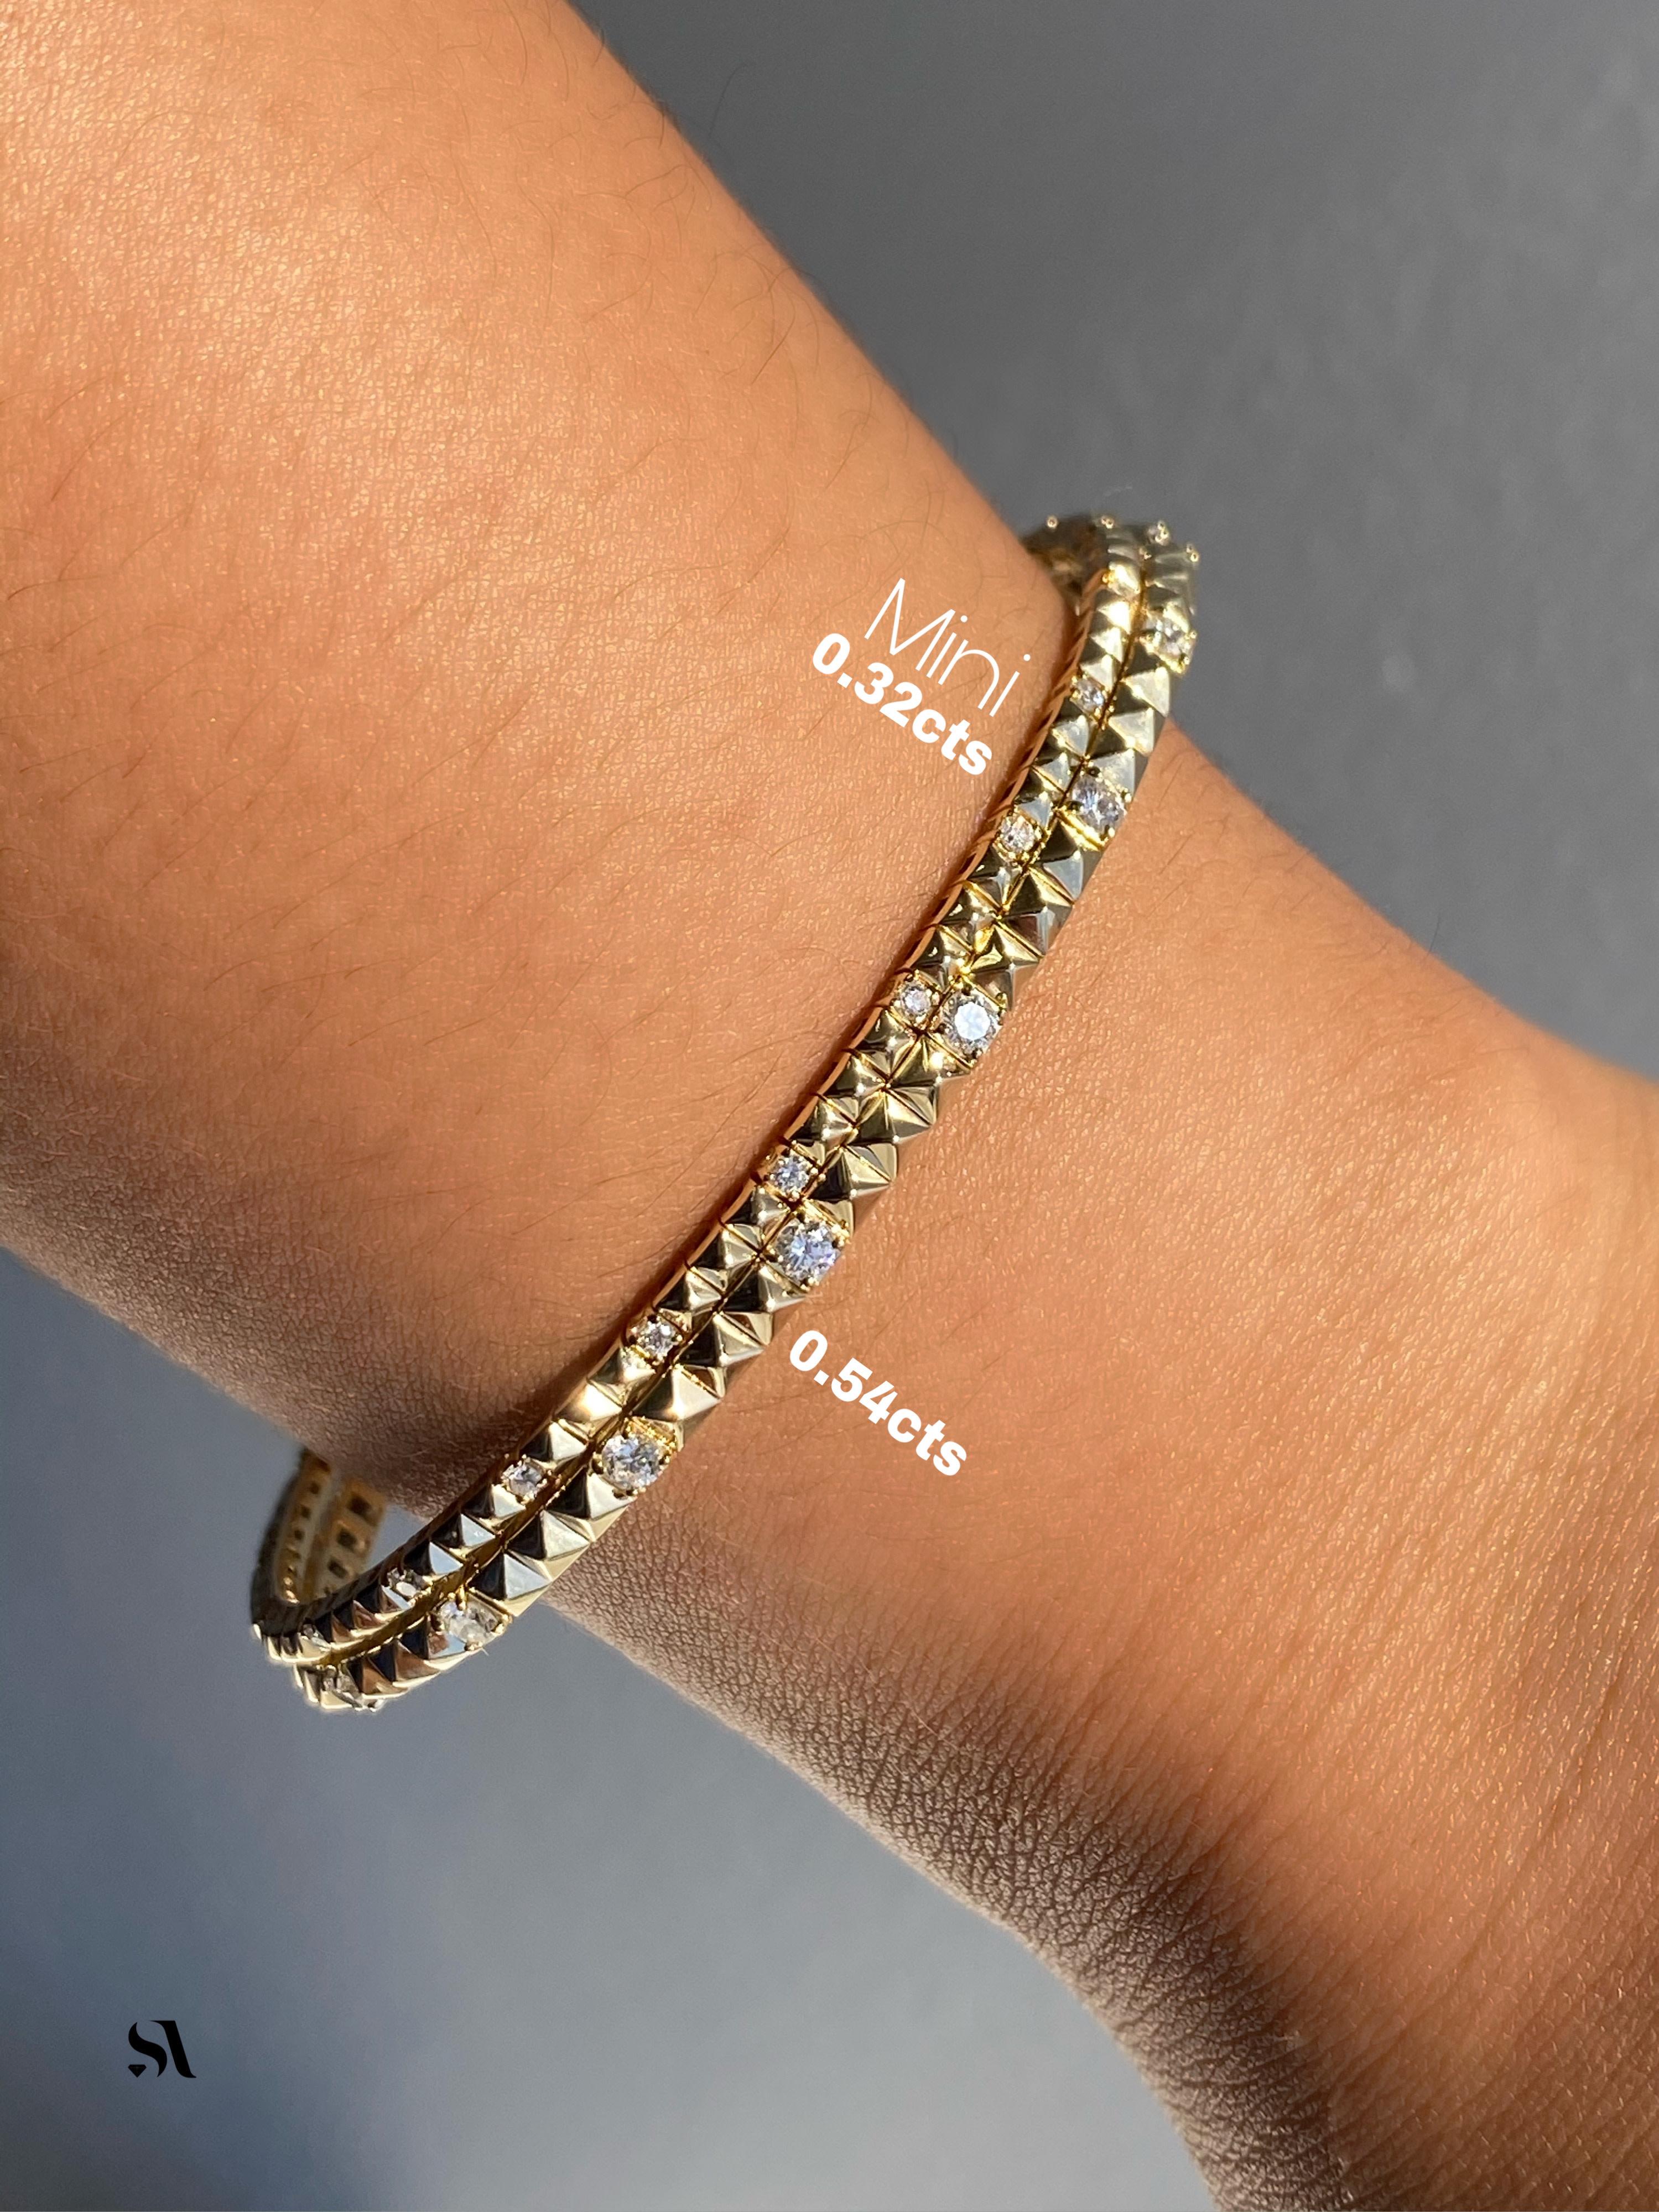 14k pyramid bracelet shown wearing